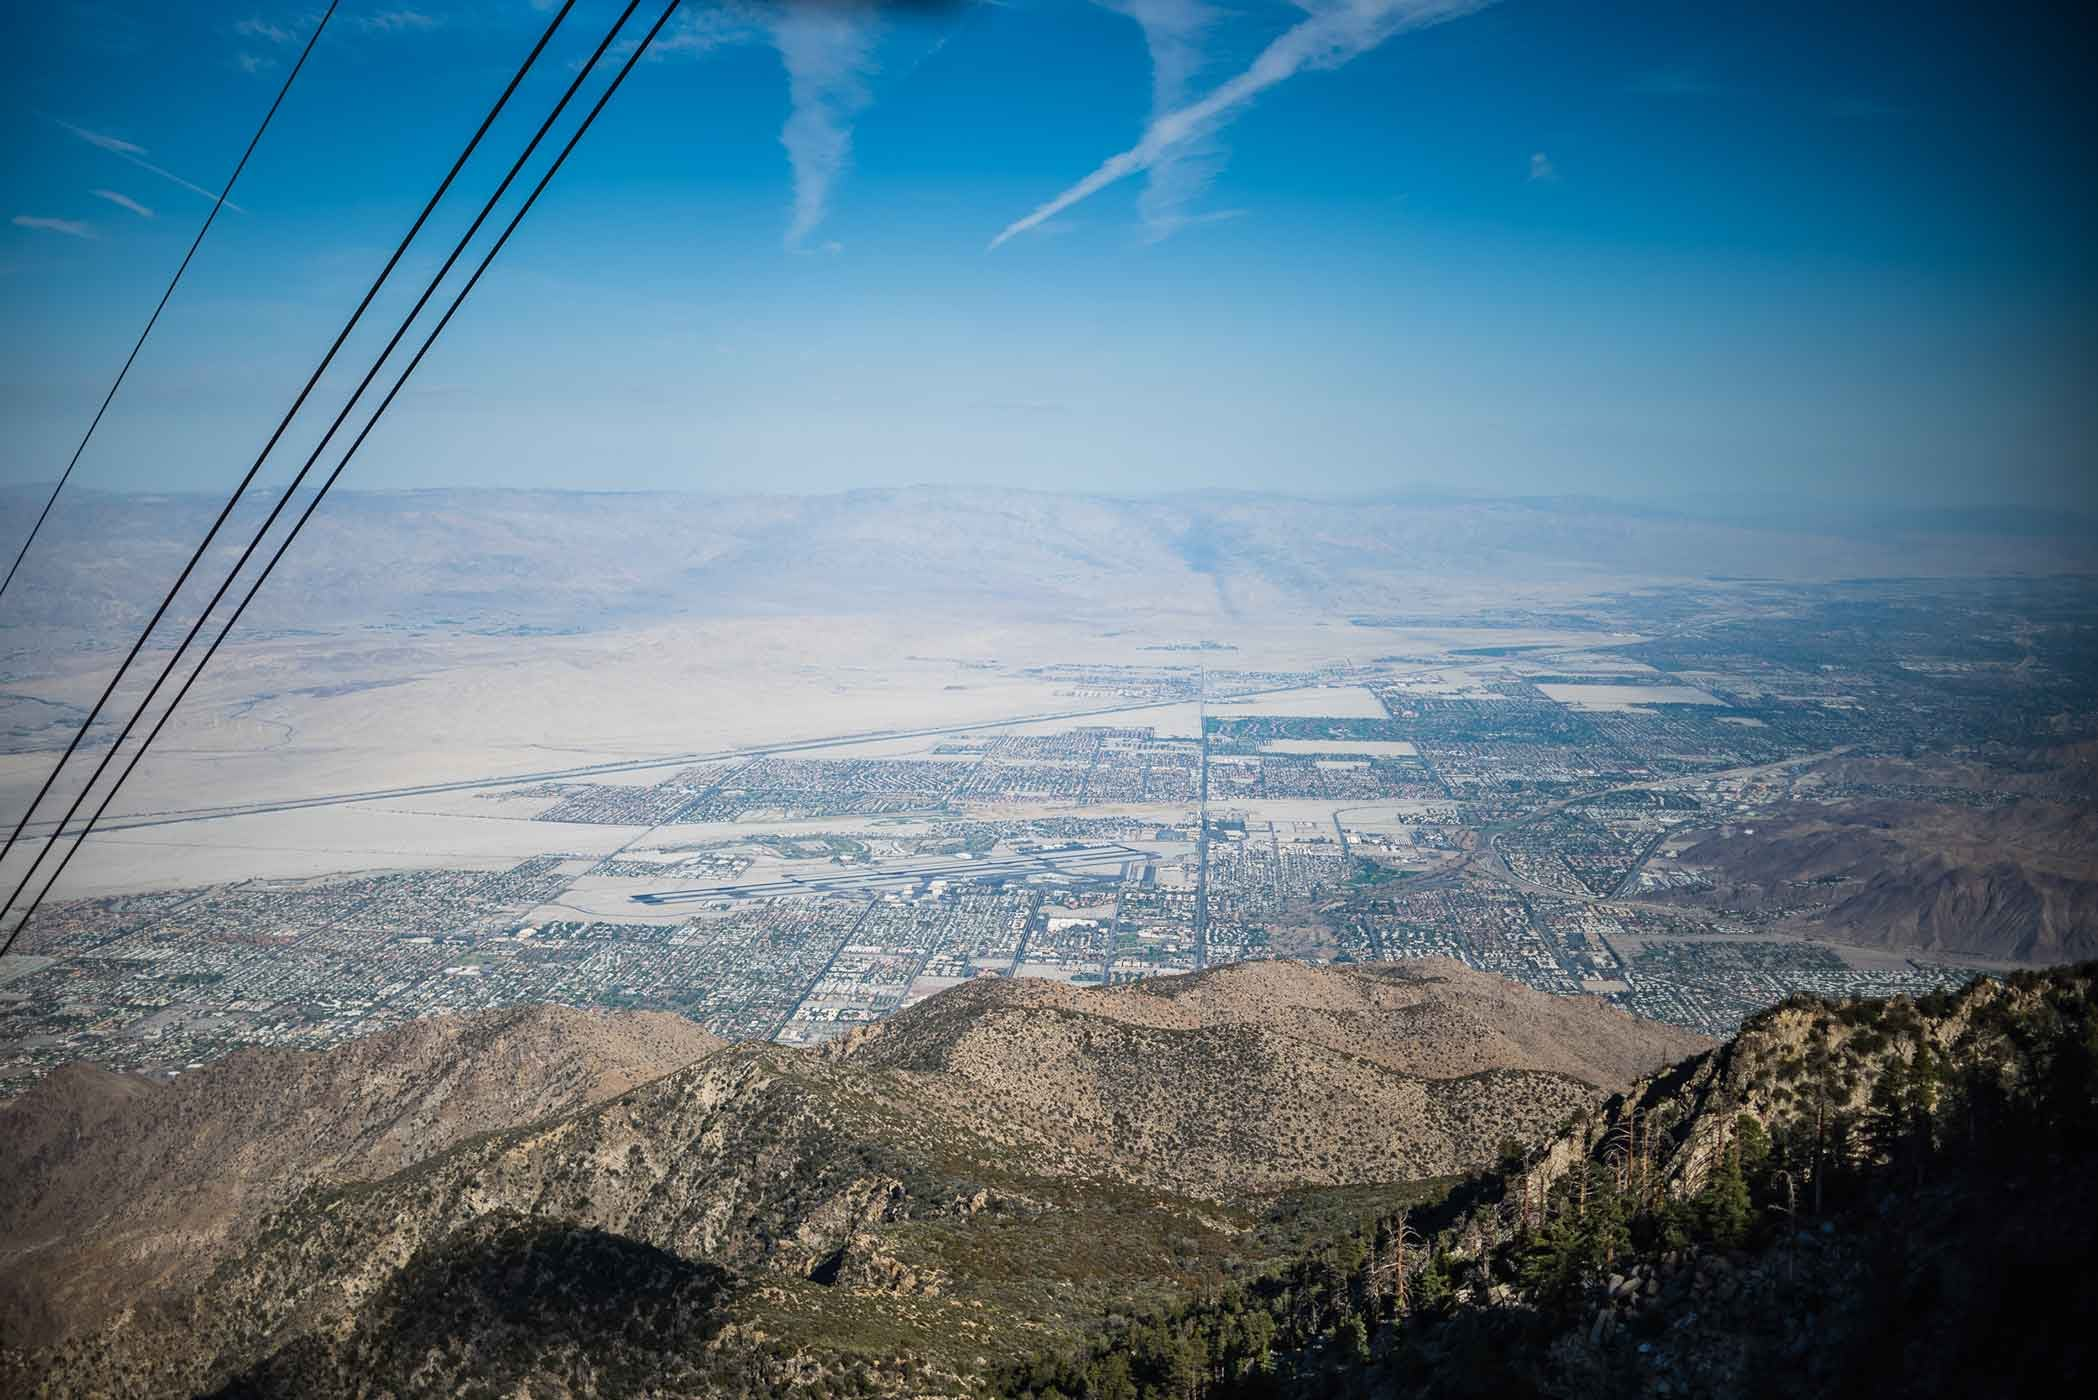 smlPalm-Springs-Aerial-Tramway---Sept-2015-19.jpg